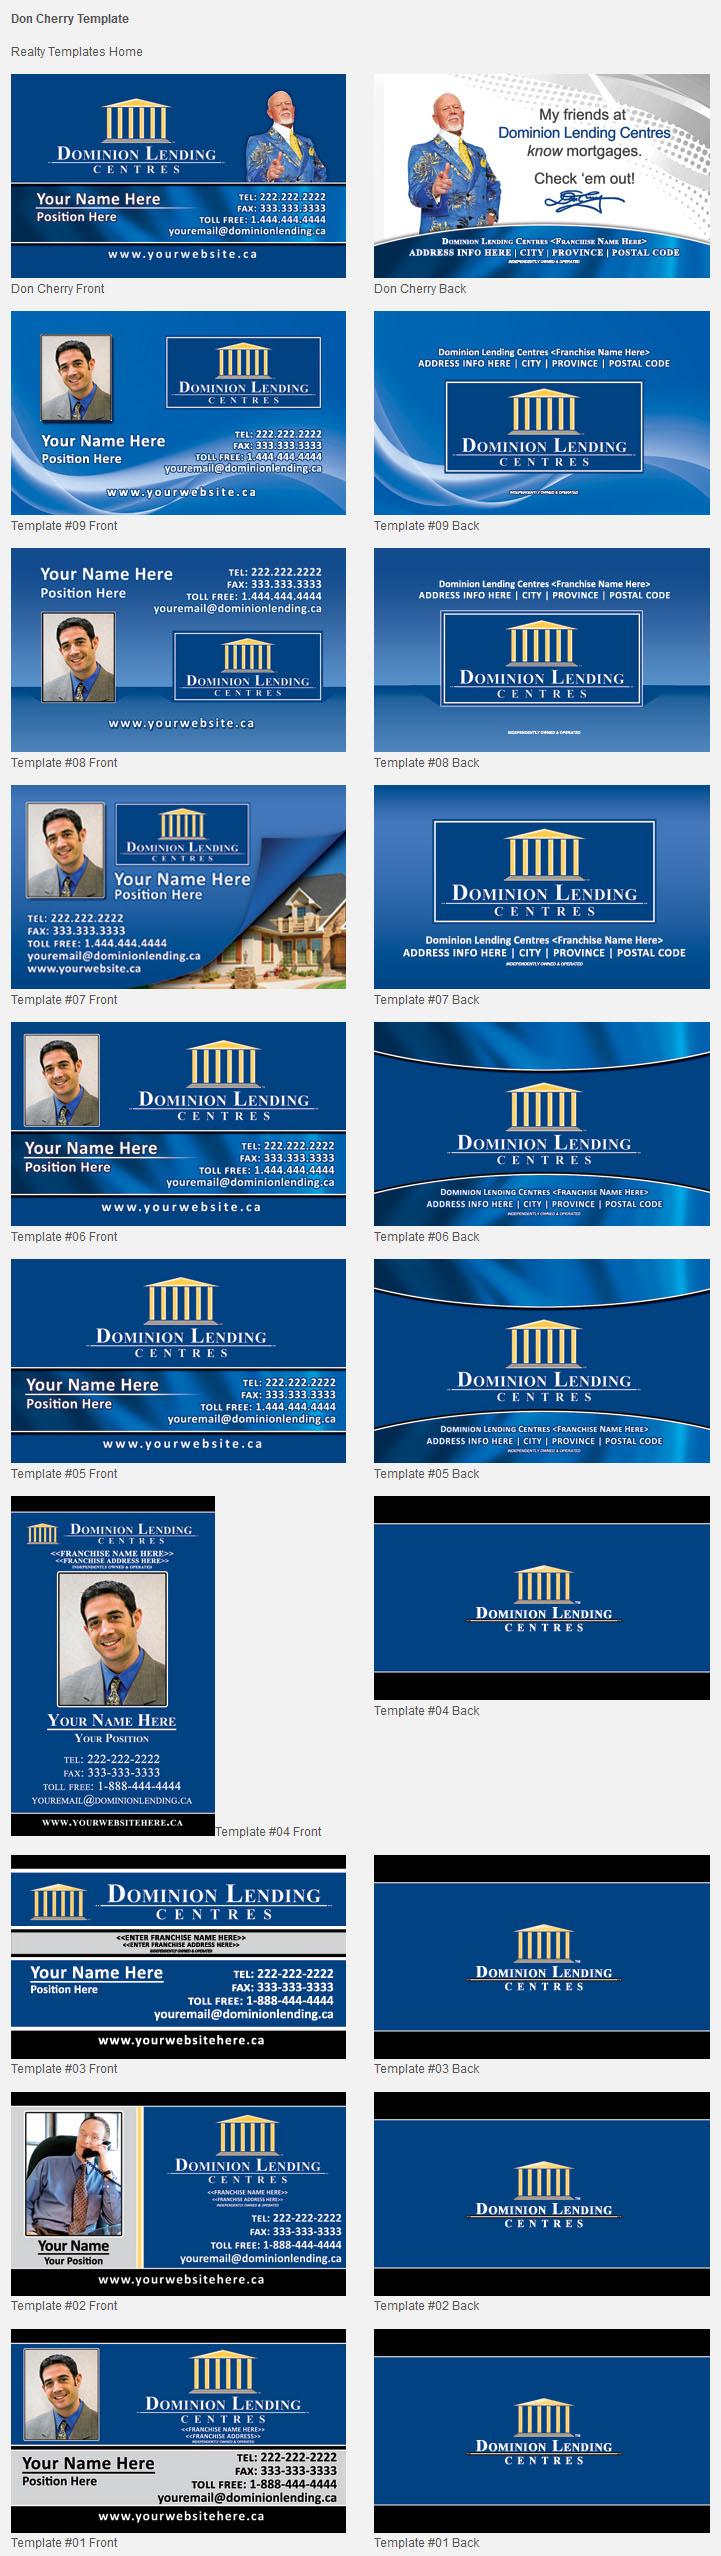 Dominion lending design templates unico print media for Dominion card template